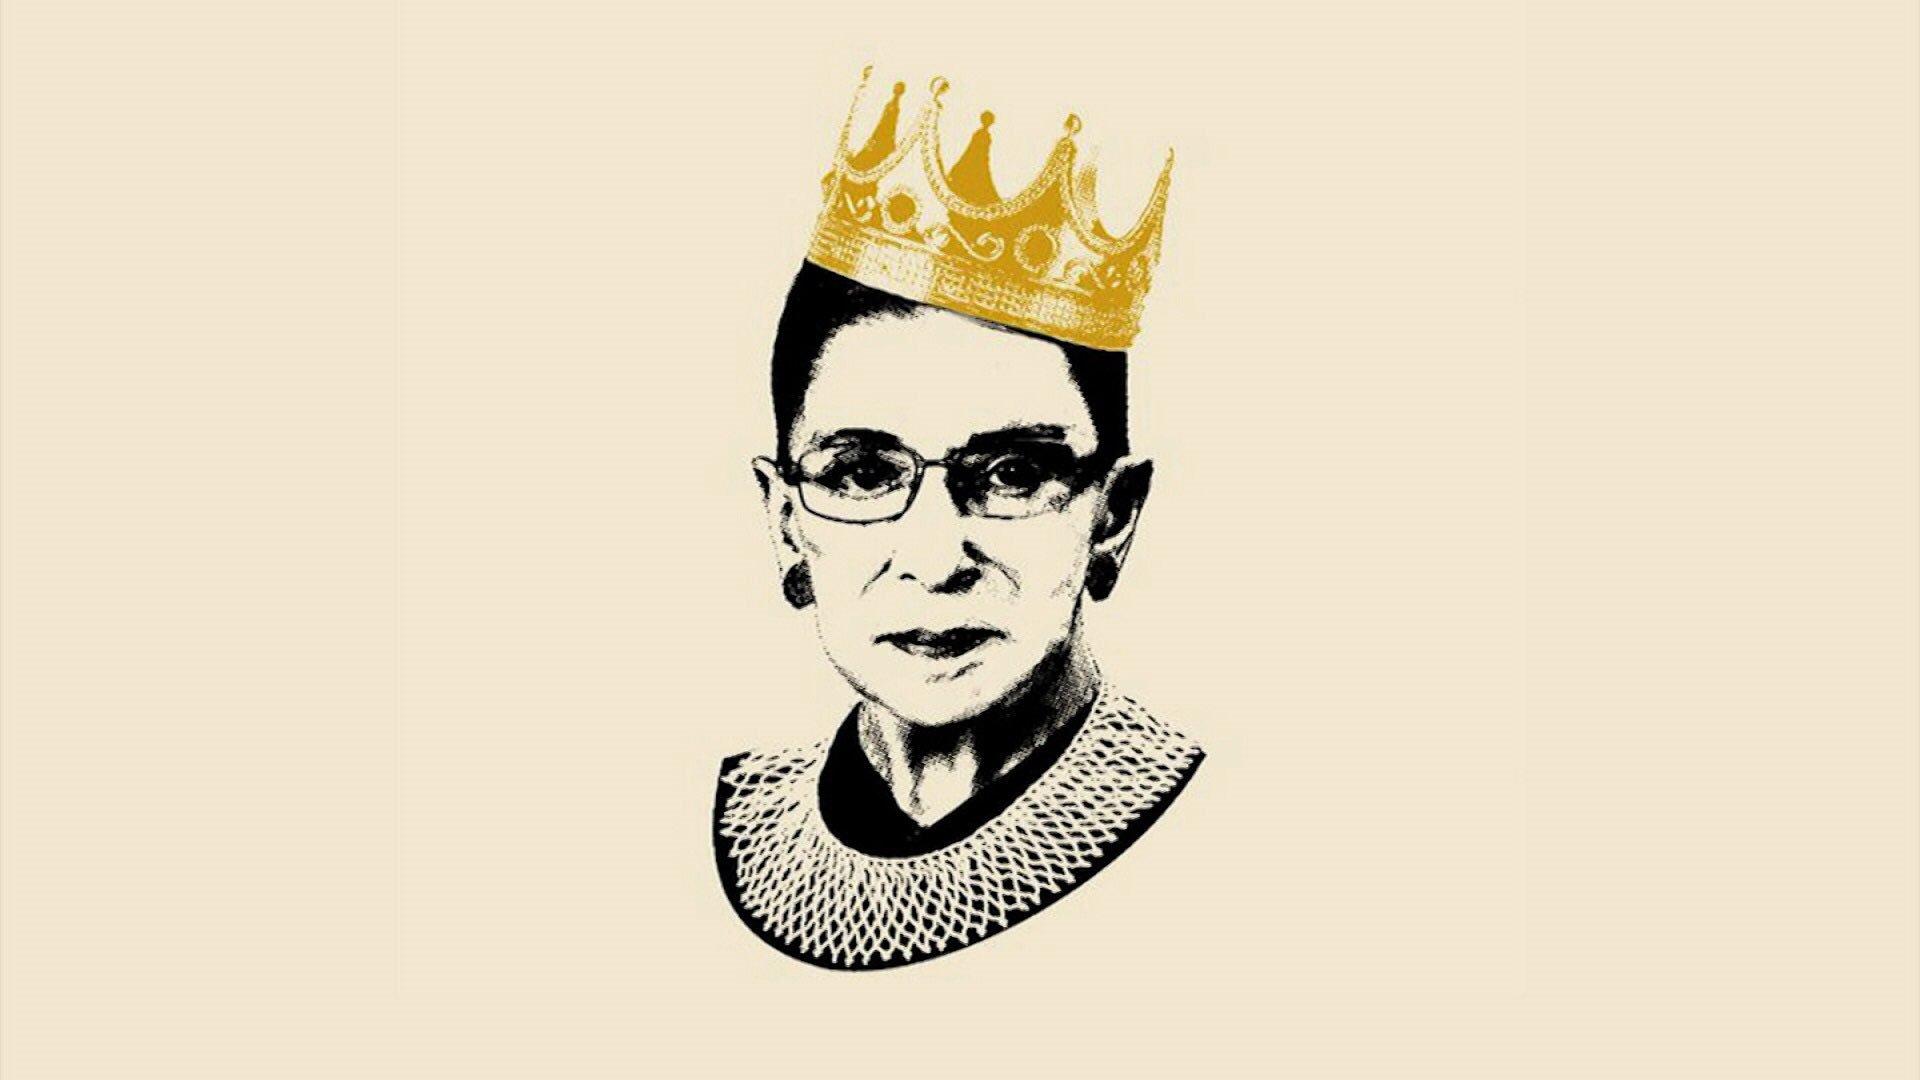 Happy Birthday to Justice Ruth Bader Ginsburg !